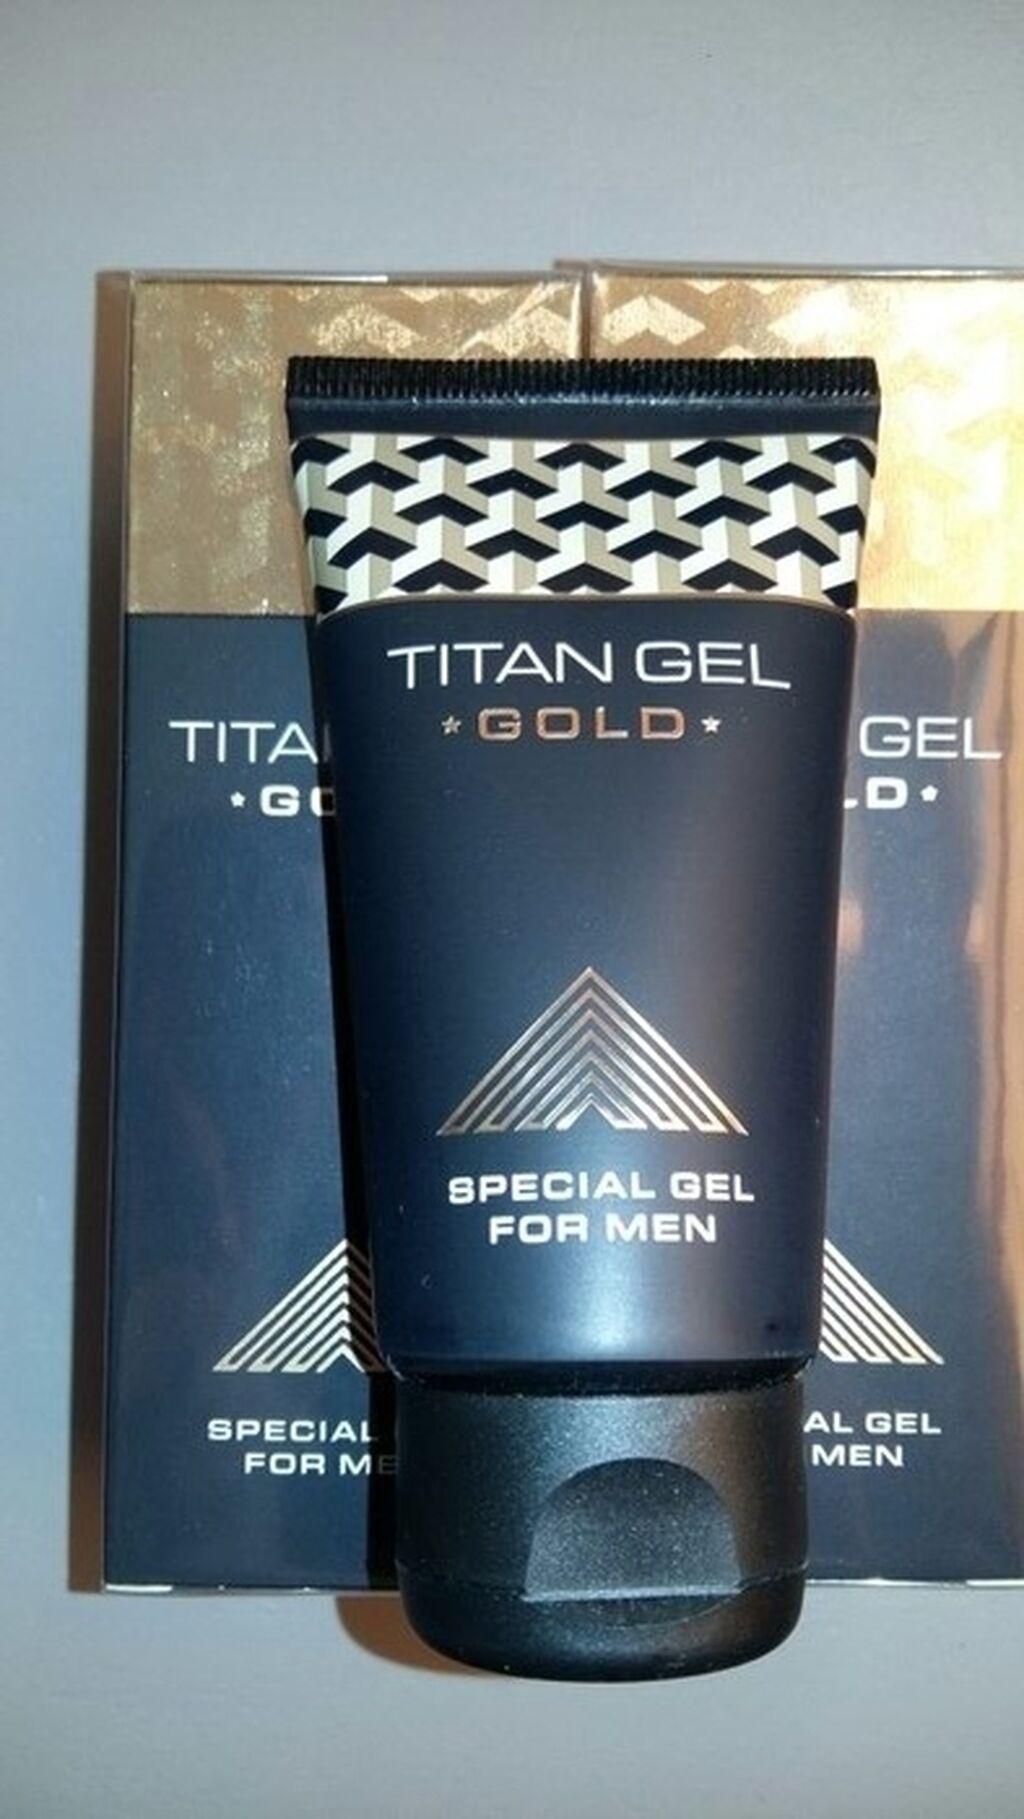 TITAN GEL GOLD ОРИГИНАЛ  100% тозаш, галограмма, штрих-код хамаш мувоф: TITAN GEL GOLD ОРИГИНАЛ  100% тозаш, галограмма, штрих-код хамаш мувоф